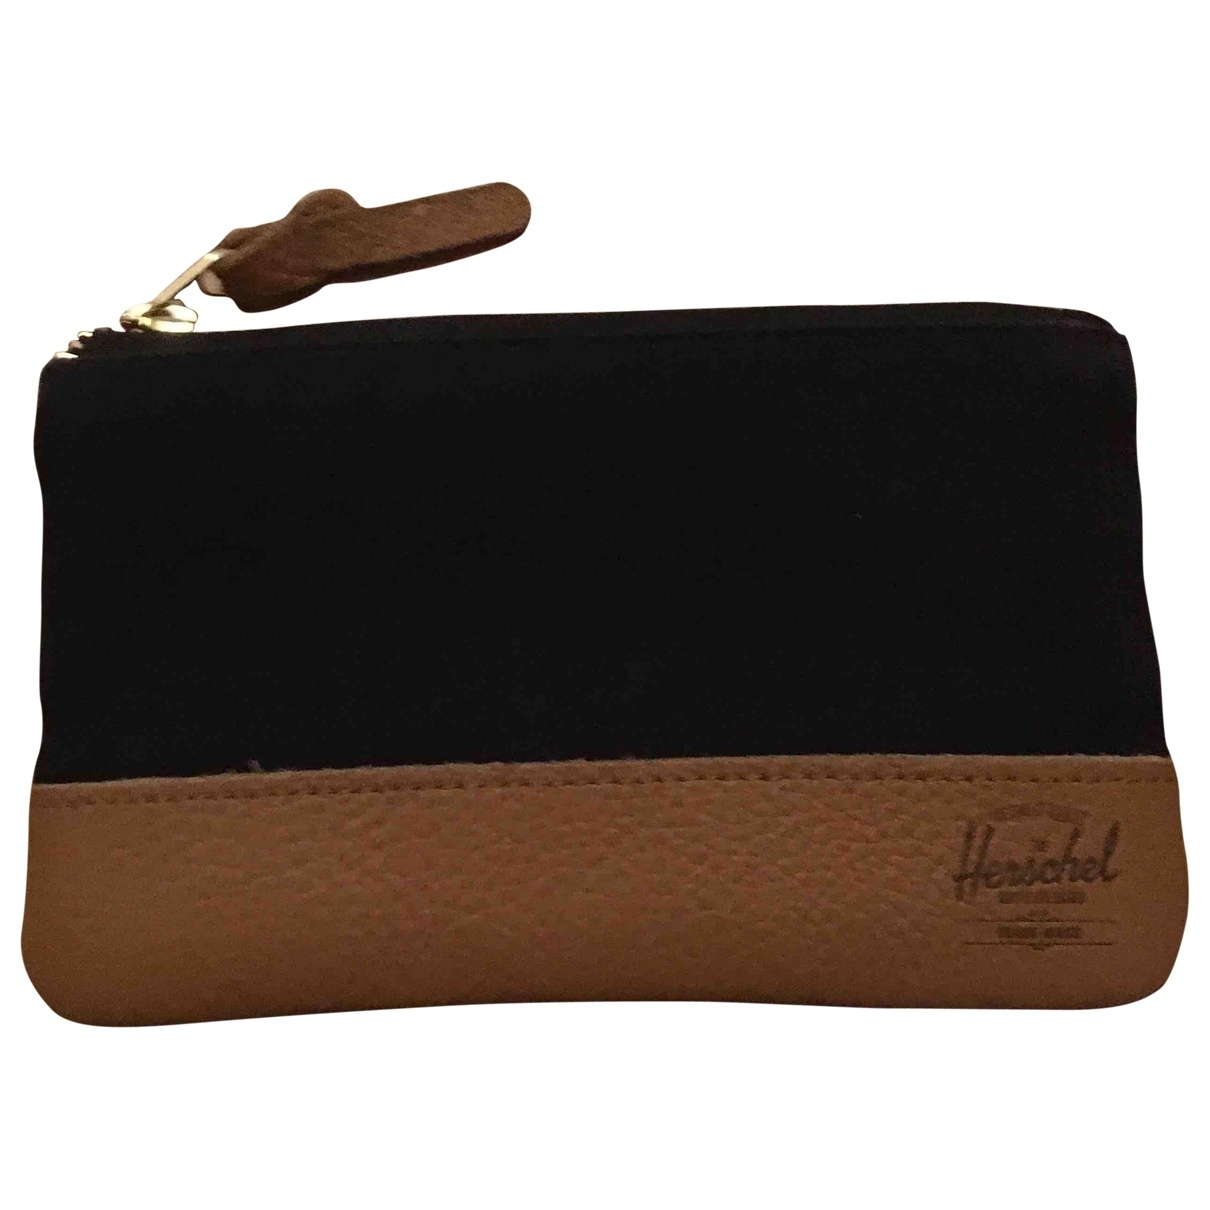 Herschel \N Black Cotton Small bag, wallet & cases for Men \N